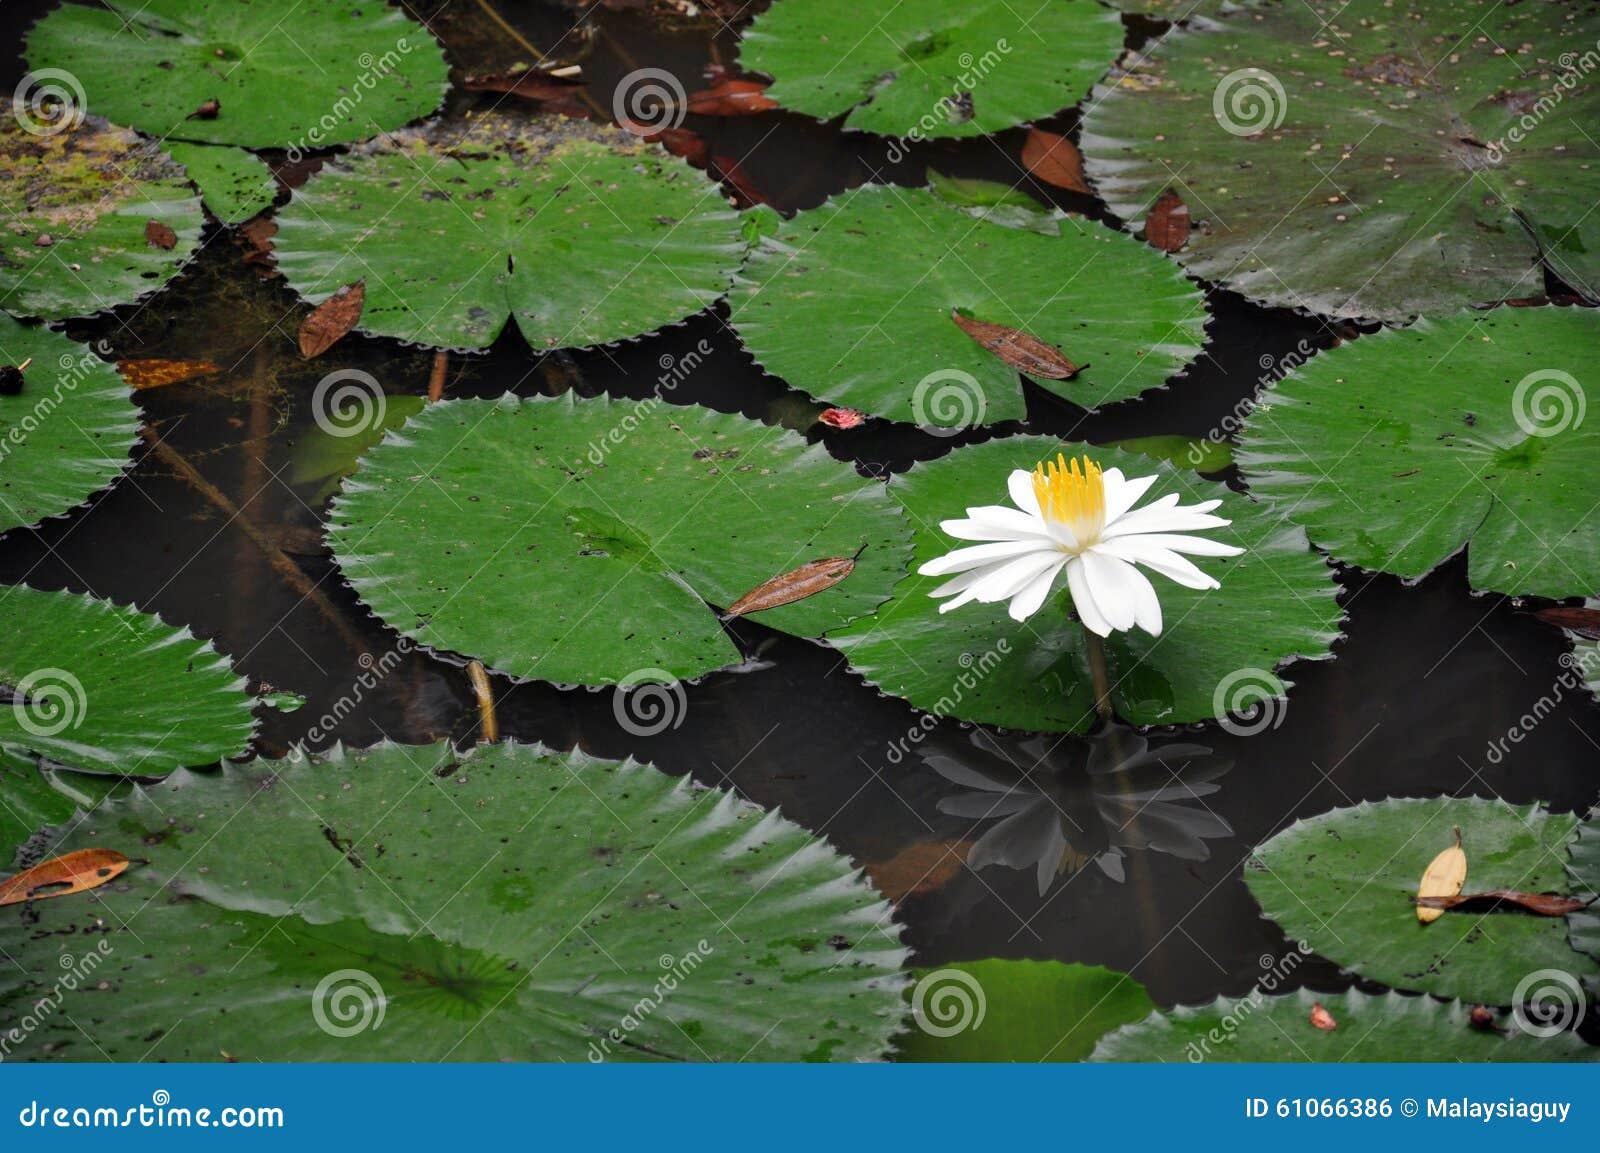 Lotus pond in kuala lumpur lake garden stock photo image for Garden pond design malaysia